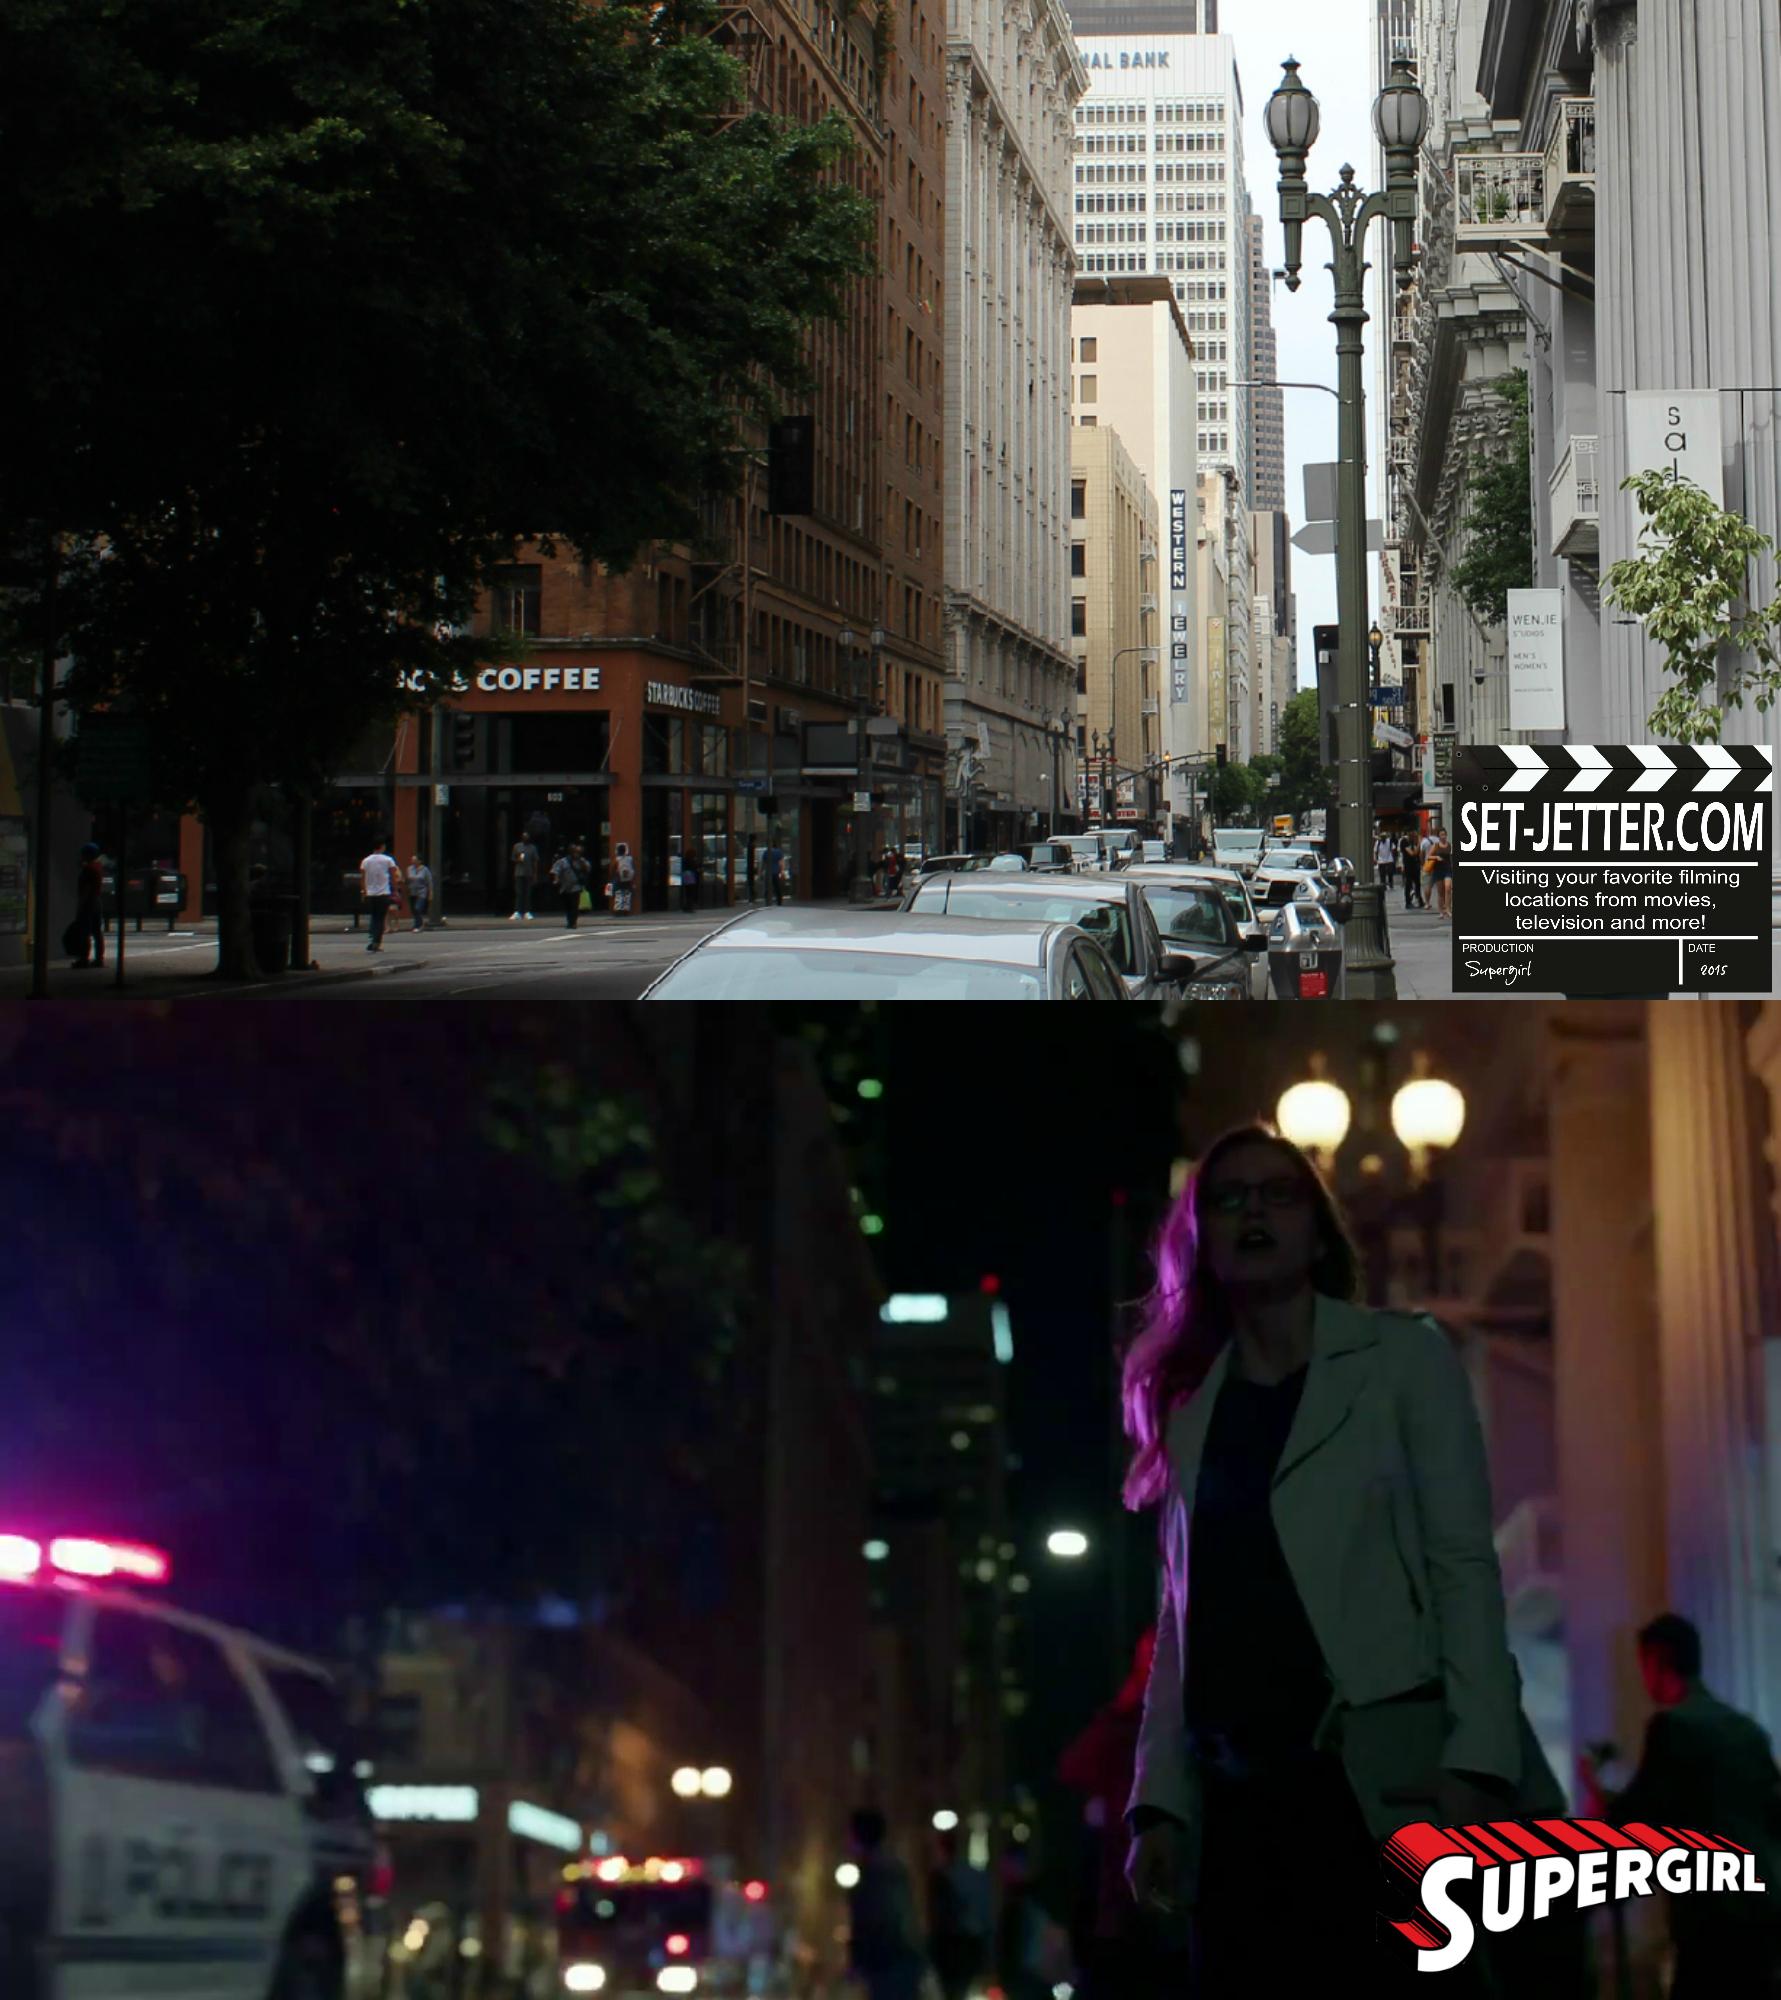 Supergirl comparison 17.jpg